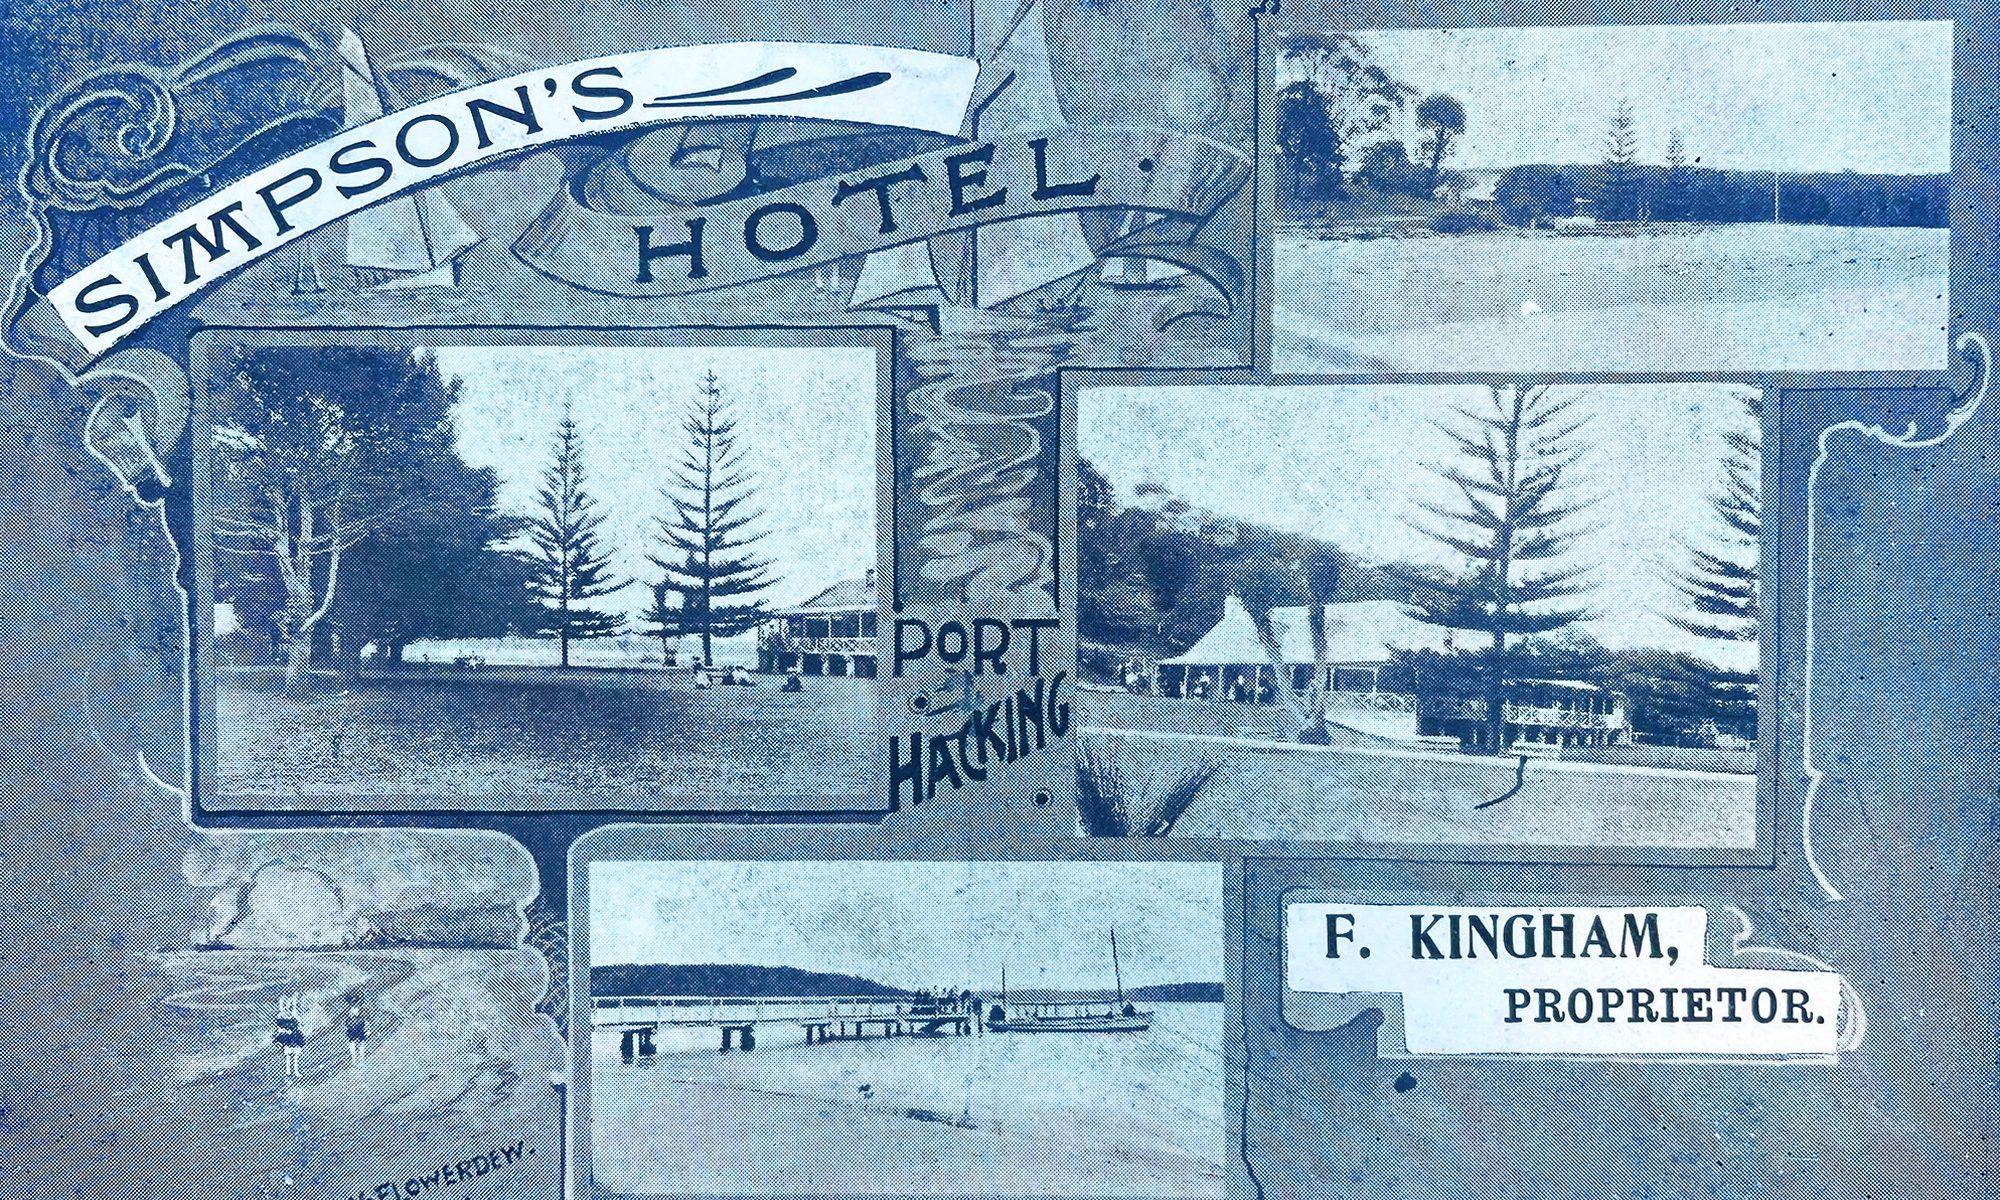 Simpson's Hotel History Postcard